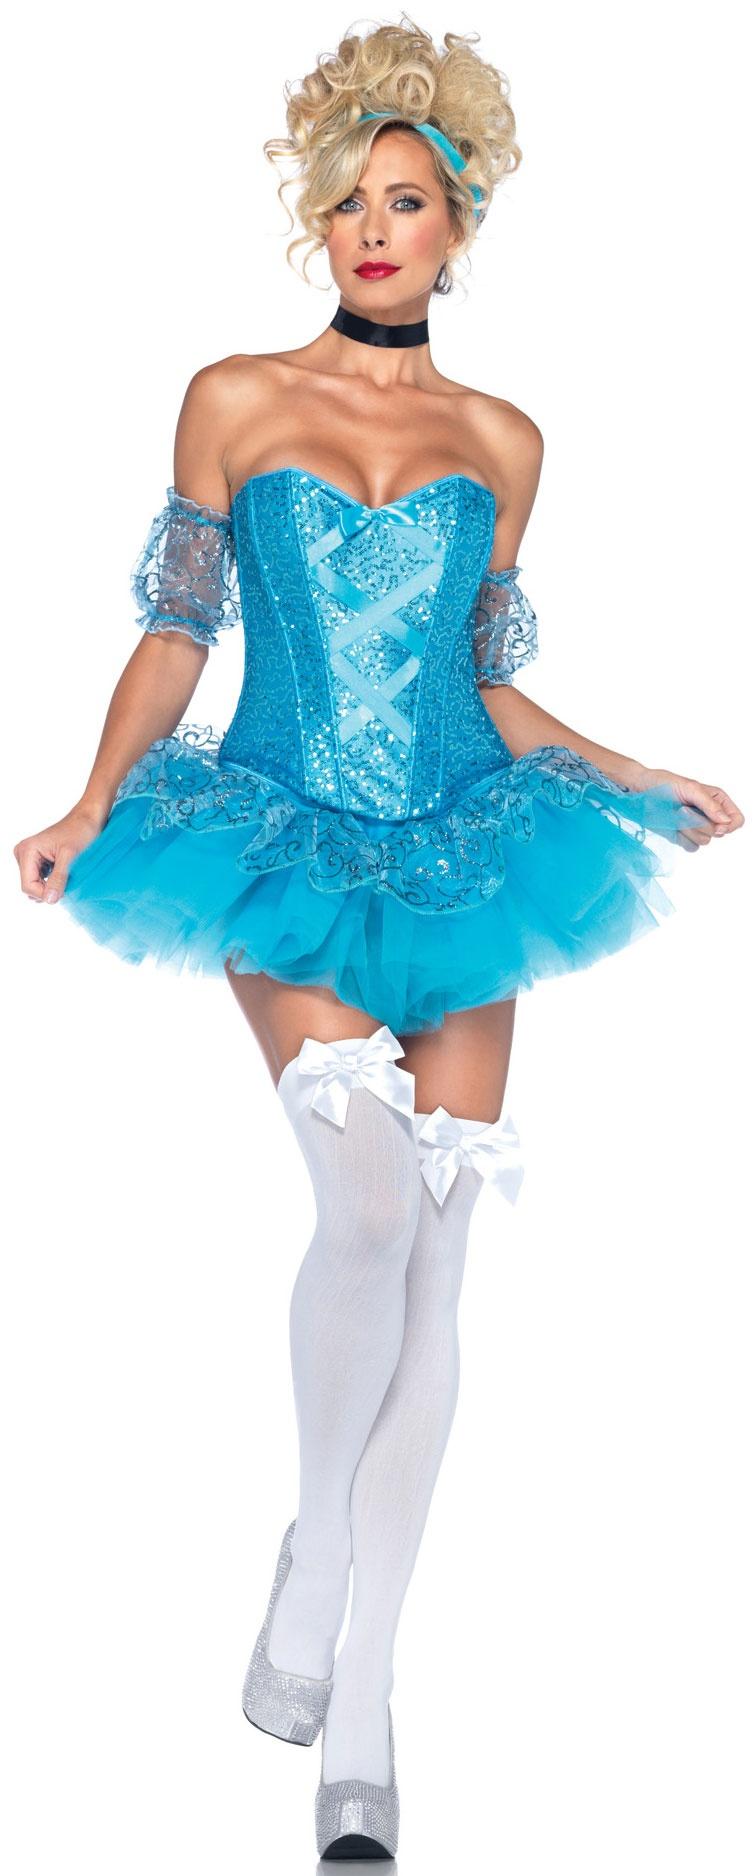 Glass Slipper Princess Cinderella Costume Costumes